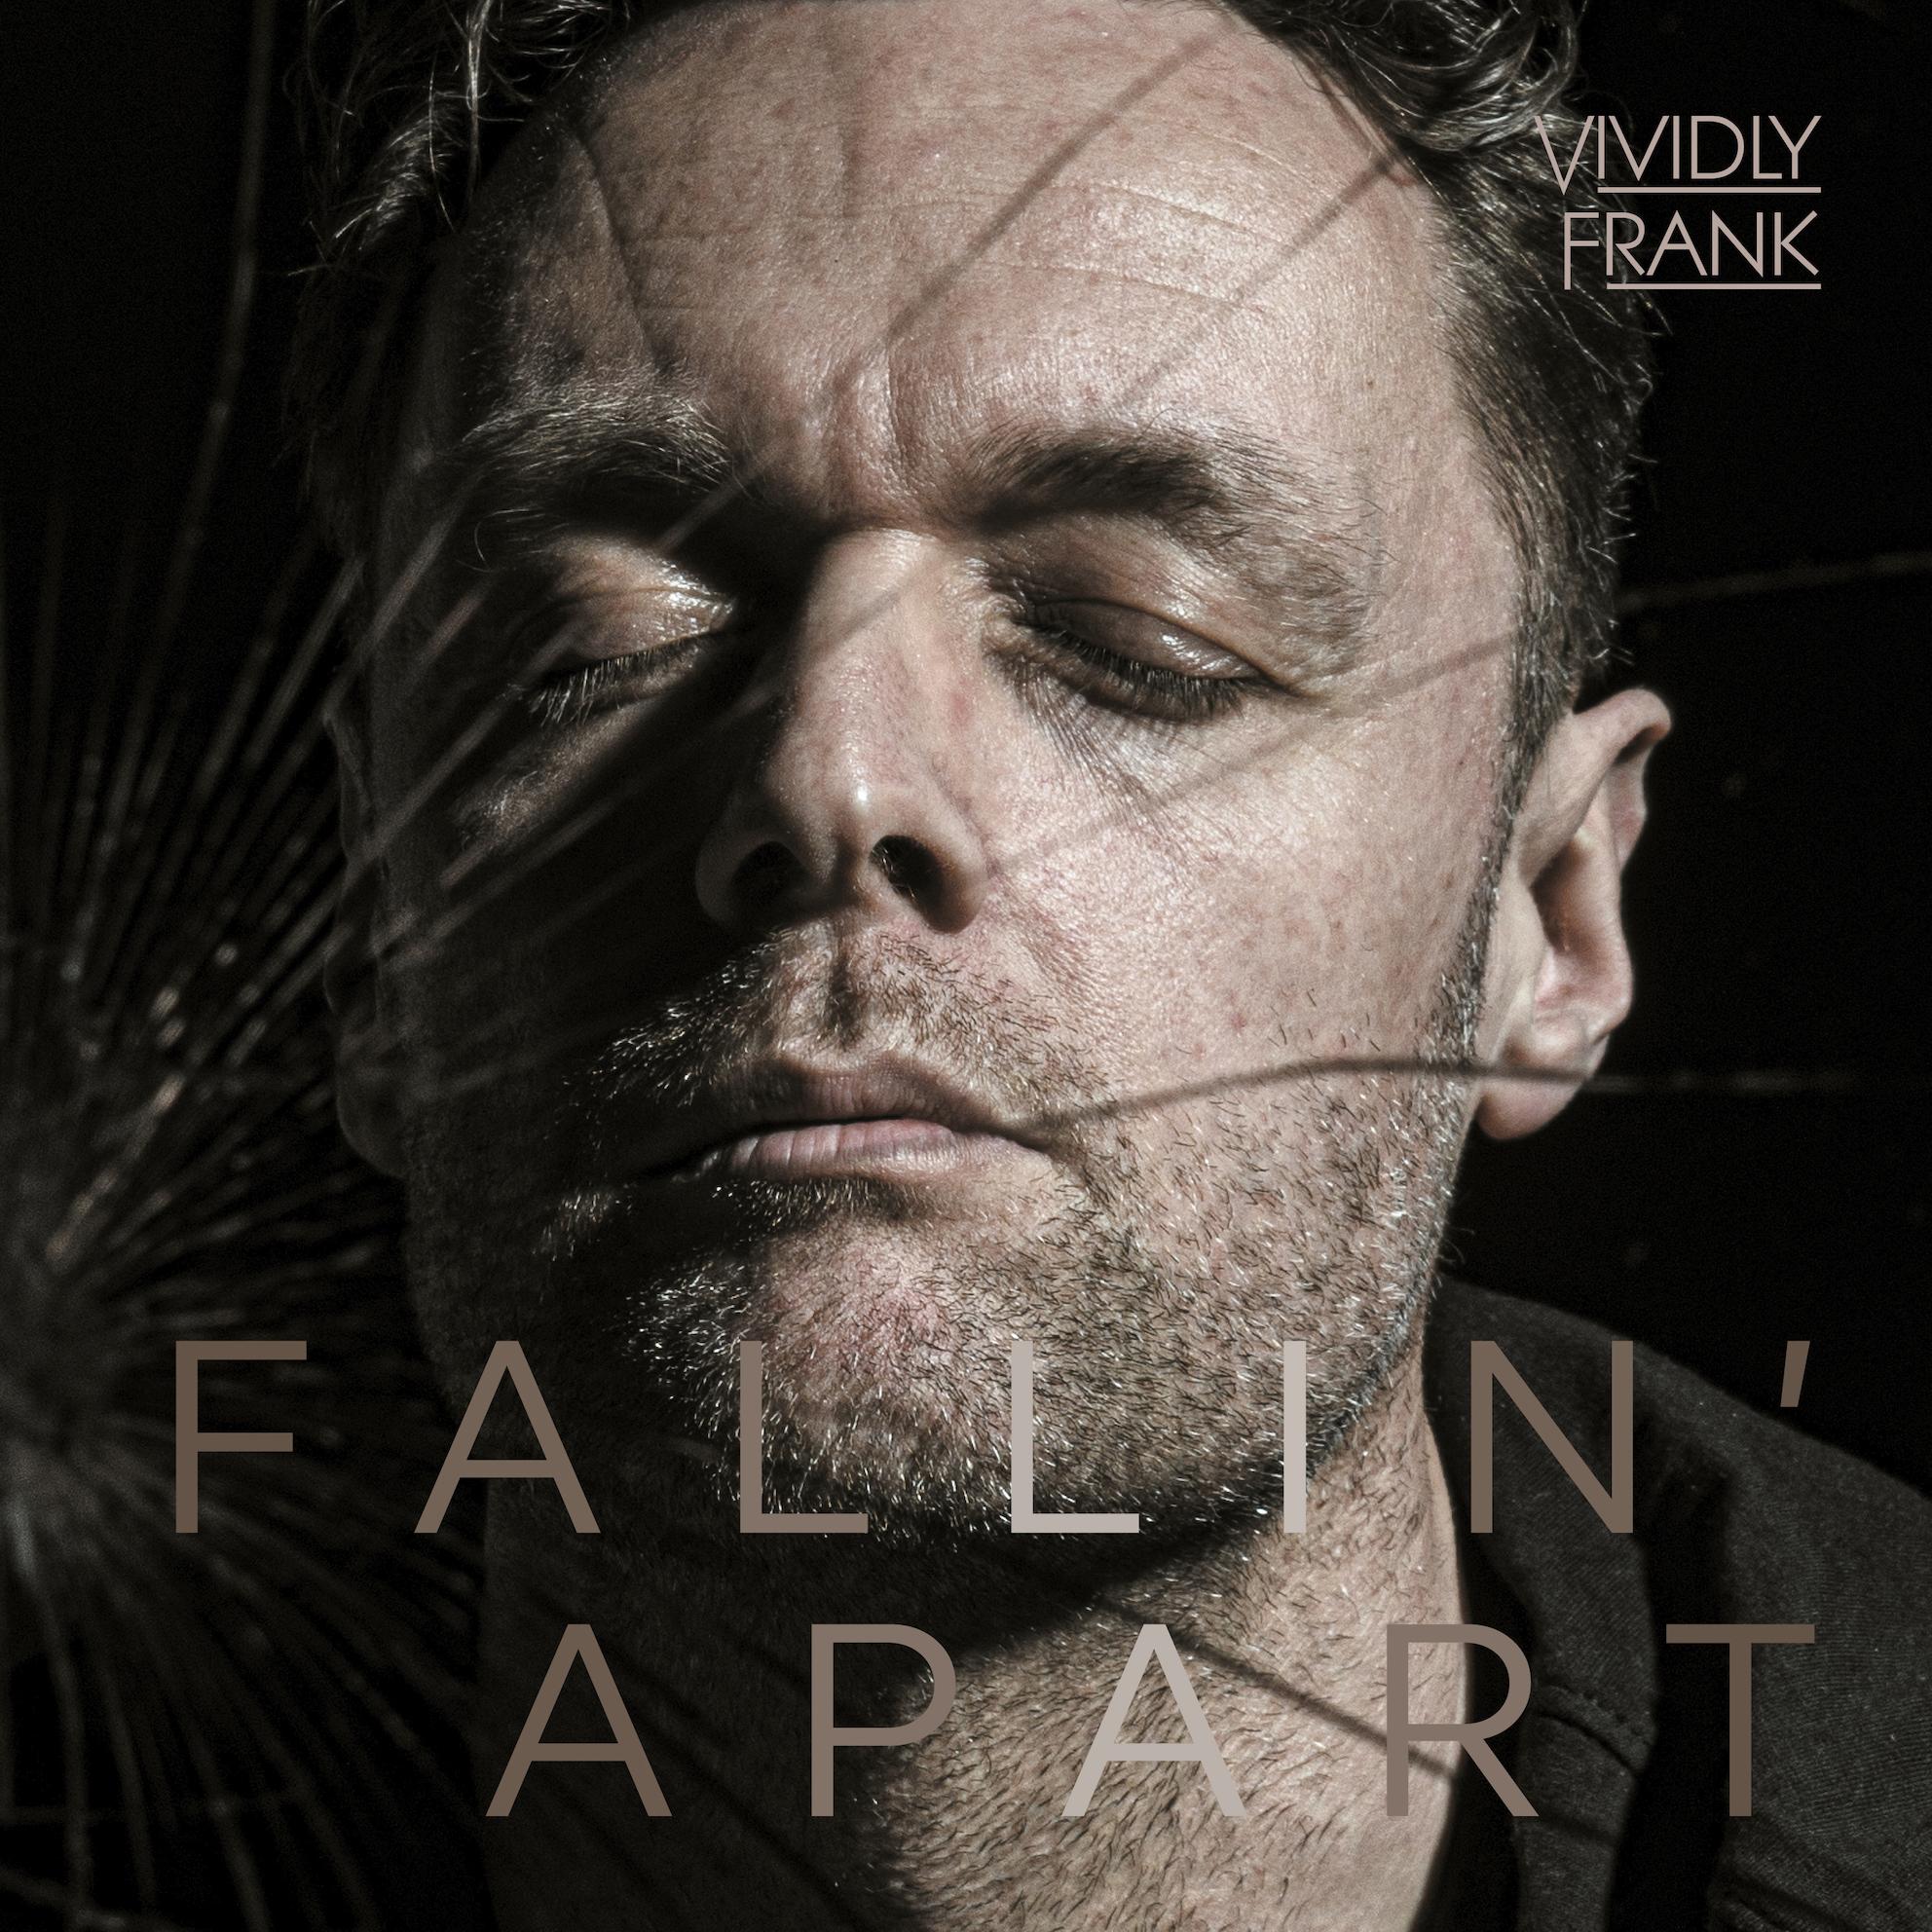 Release date 17 September 2021